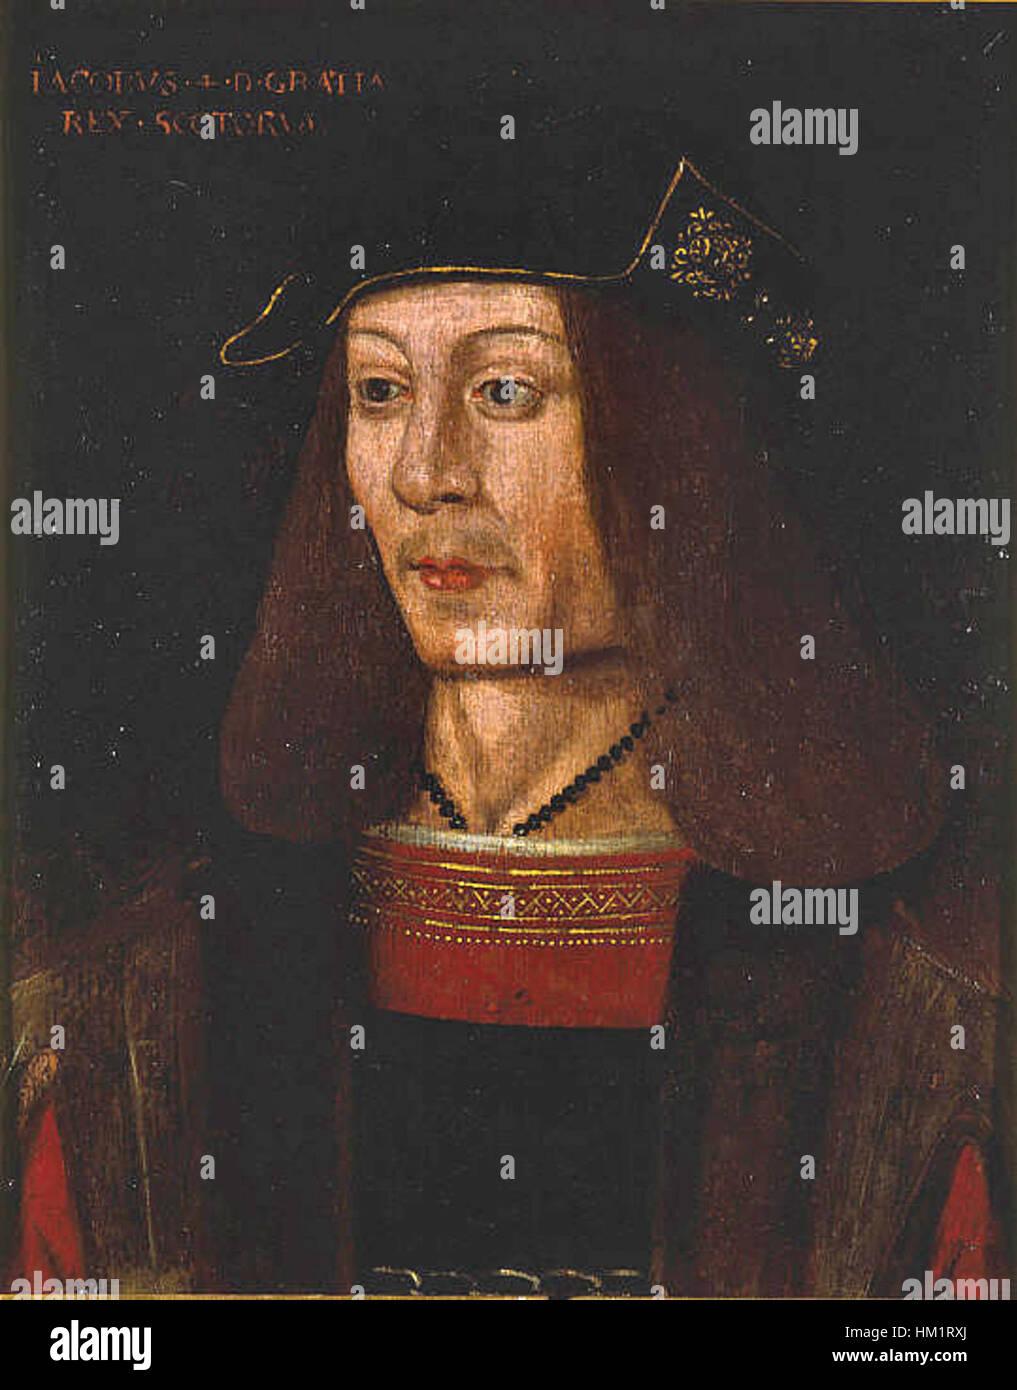 James IV of Scotland - Stock Image